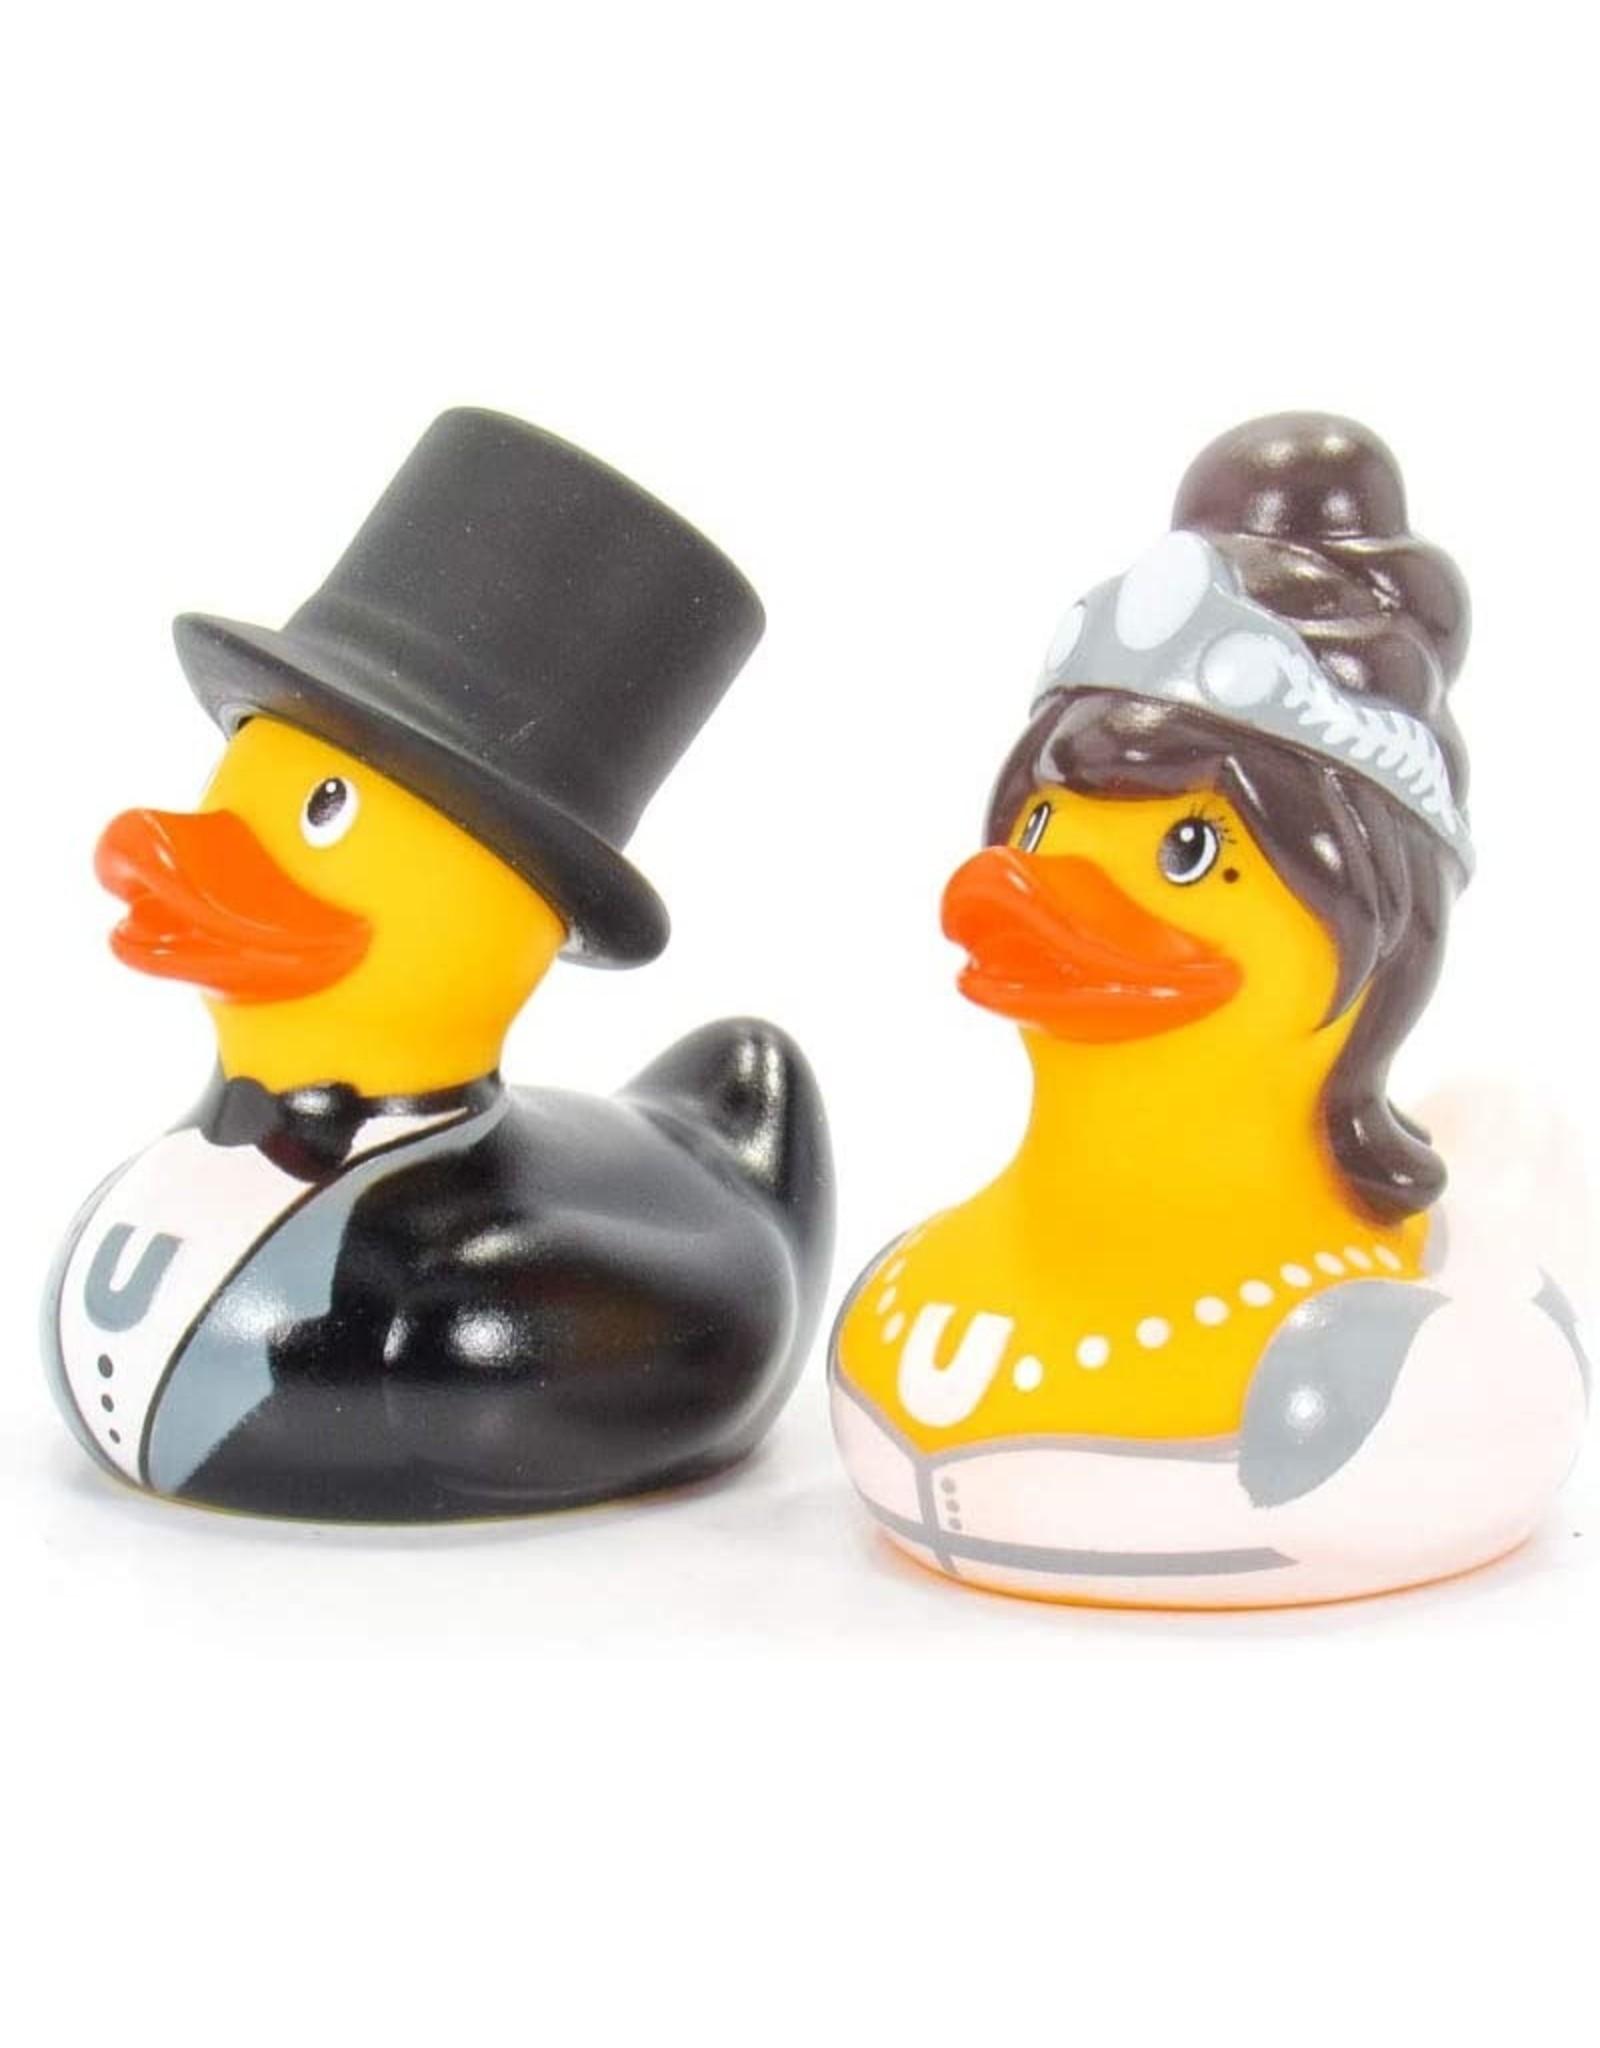 Bride & Groom Rubber Duck Mini Set